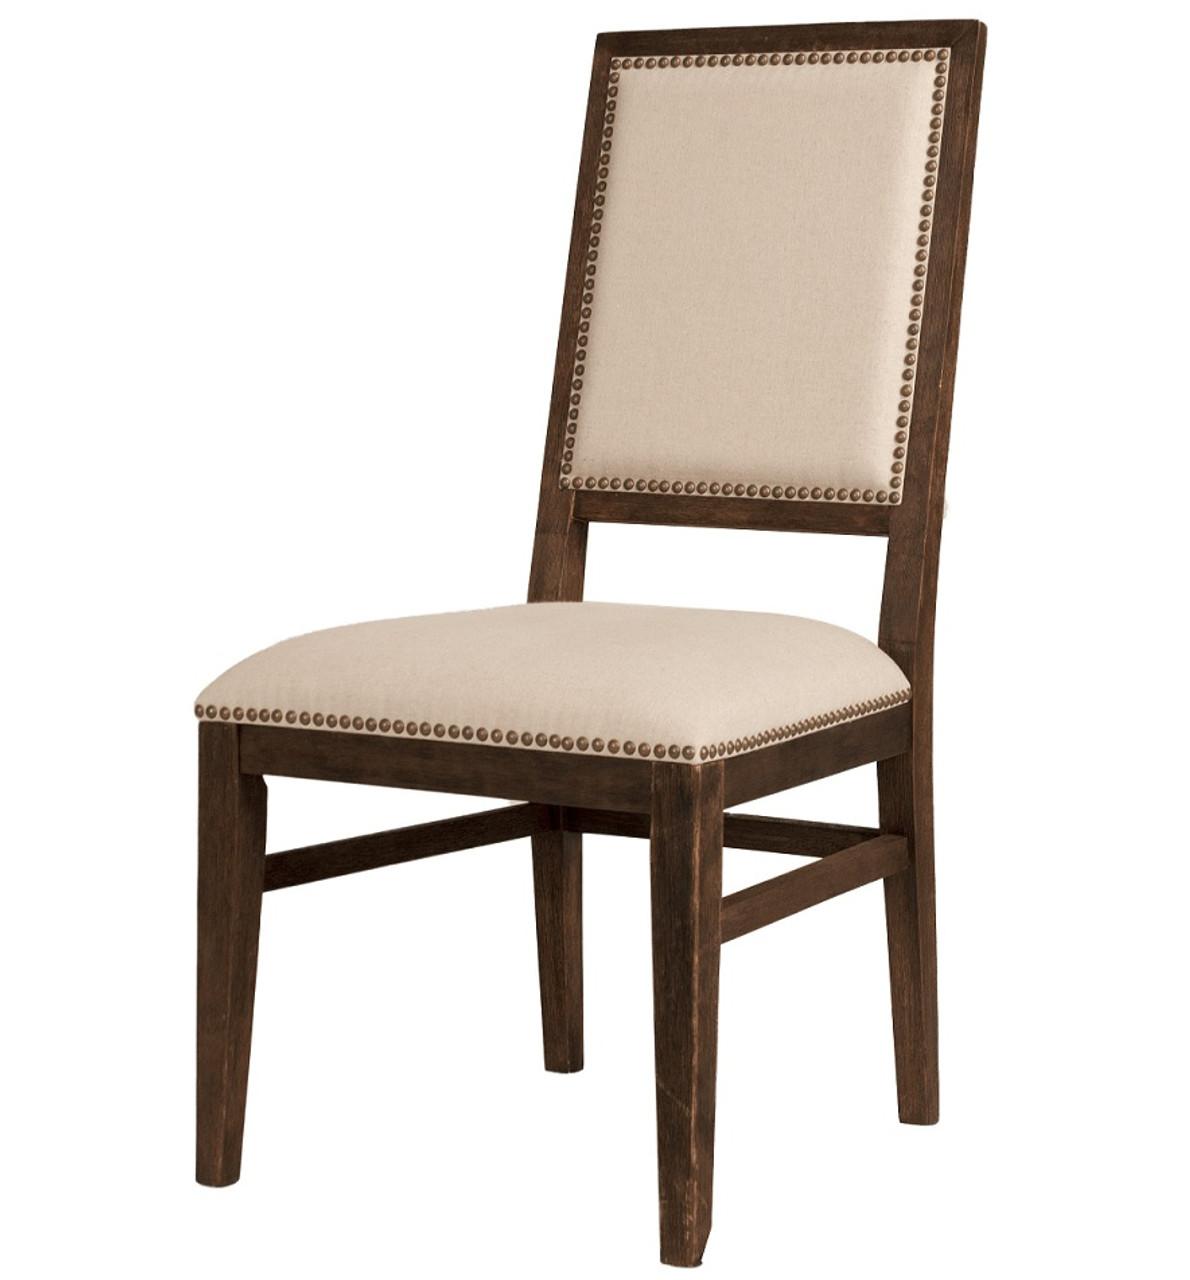 Dexter Dining Chair on uttermost furniture, broyhill furniture, zuo modern furniture, jofran furniture,